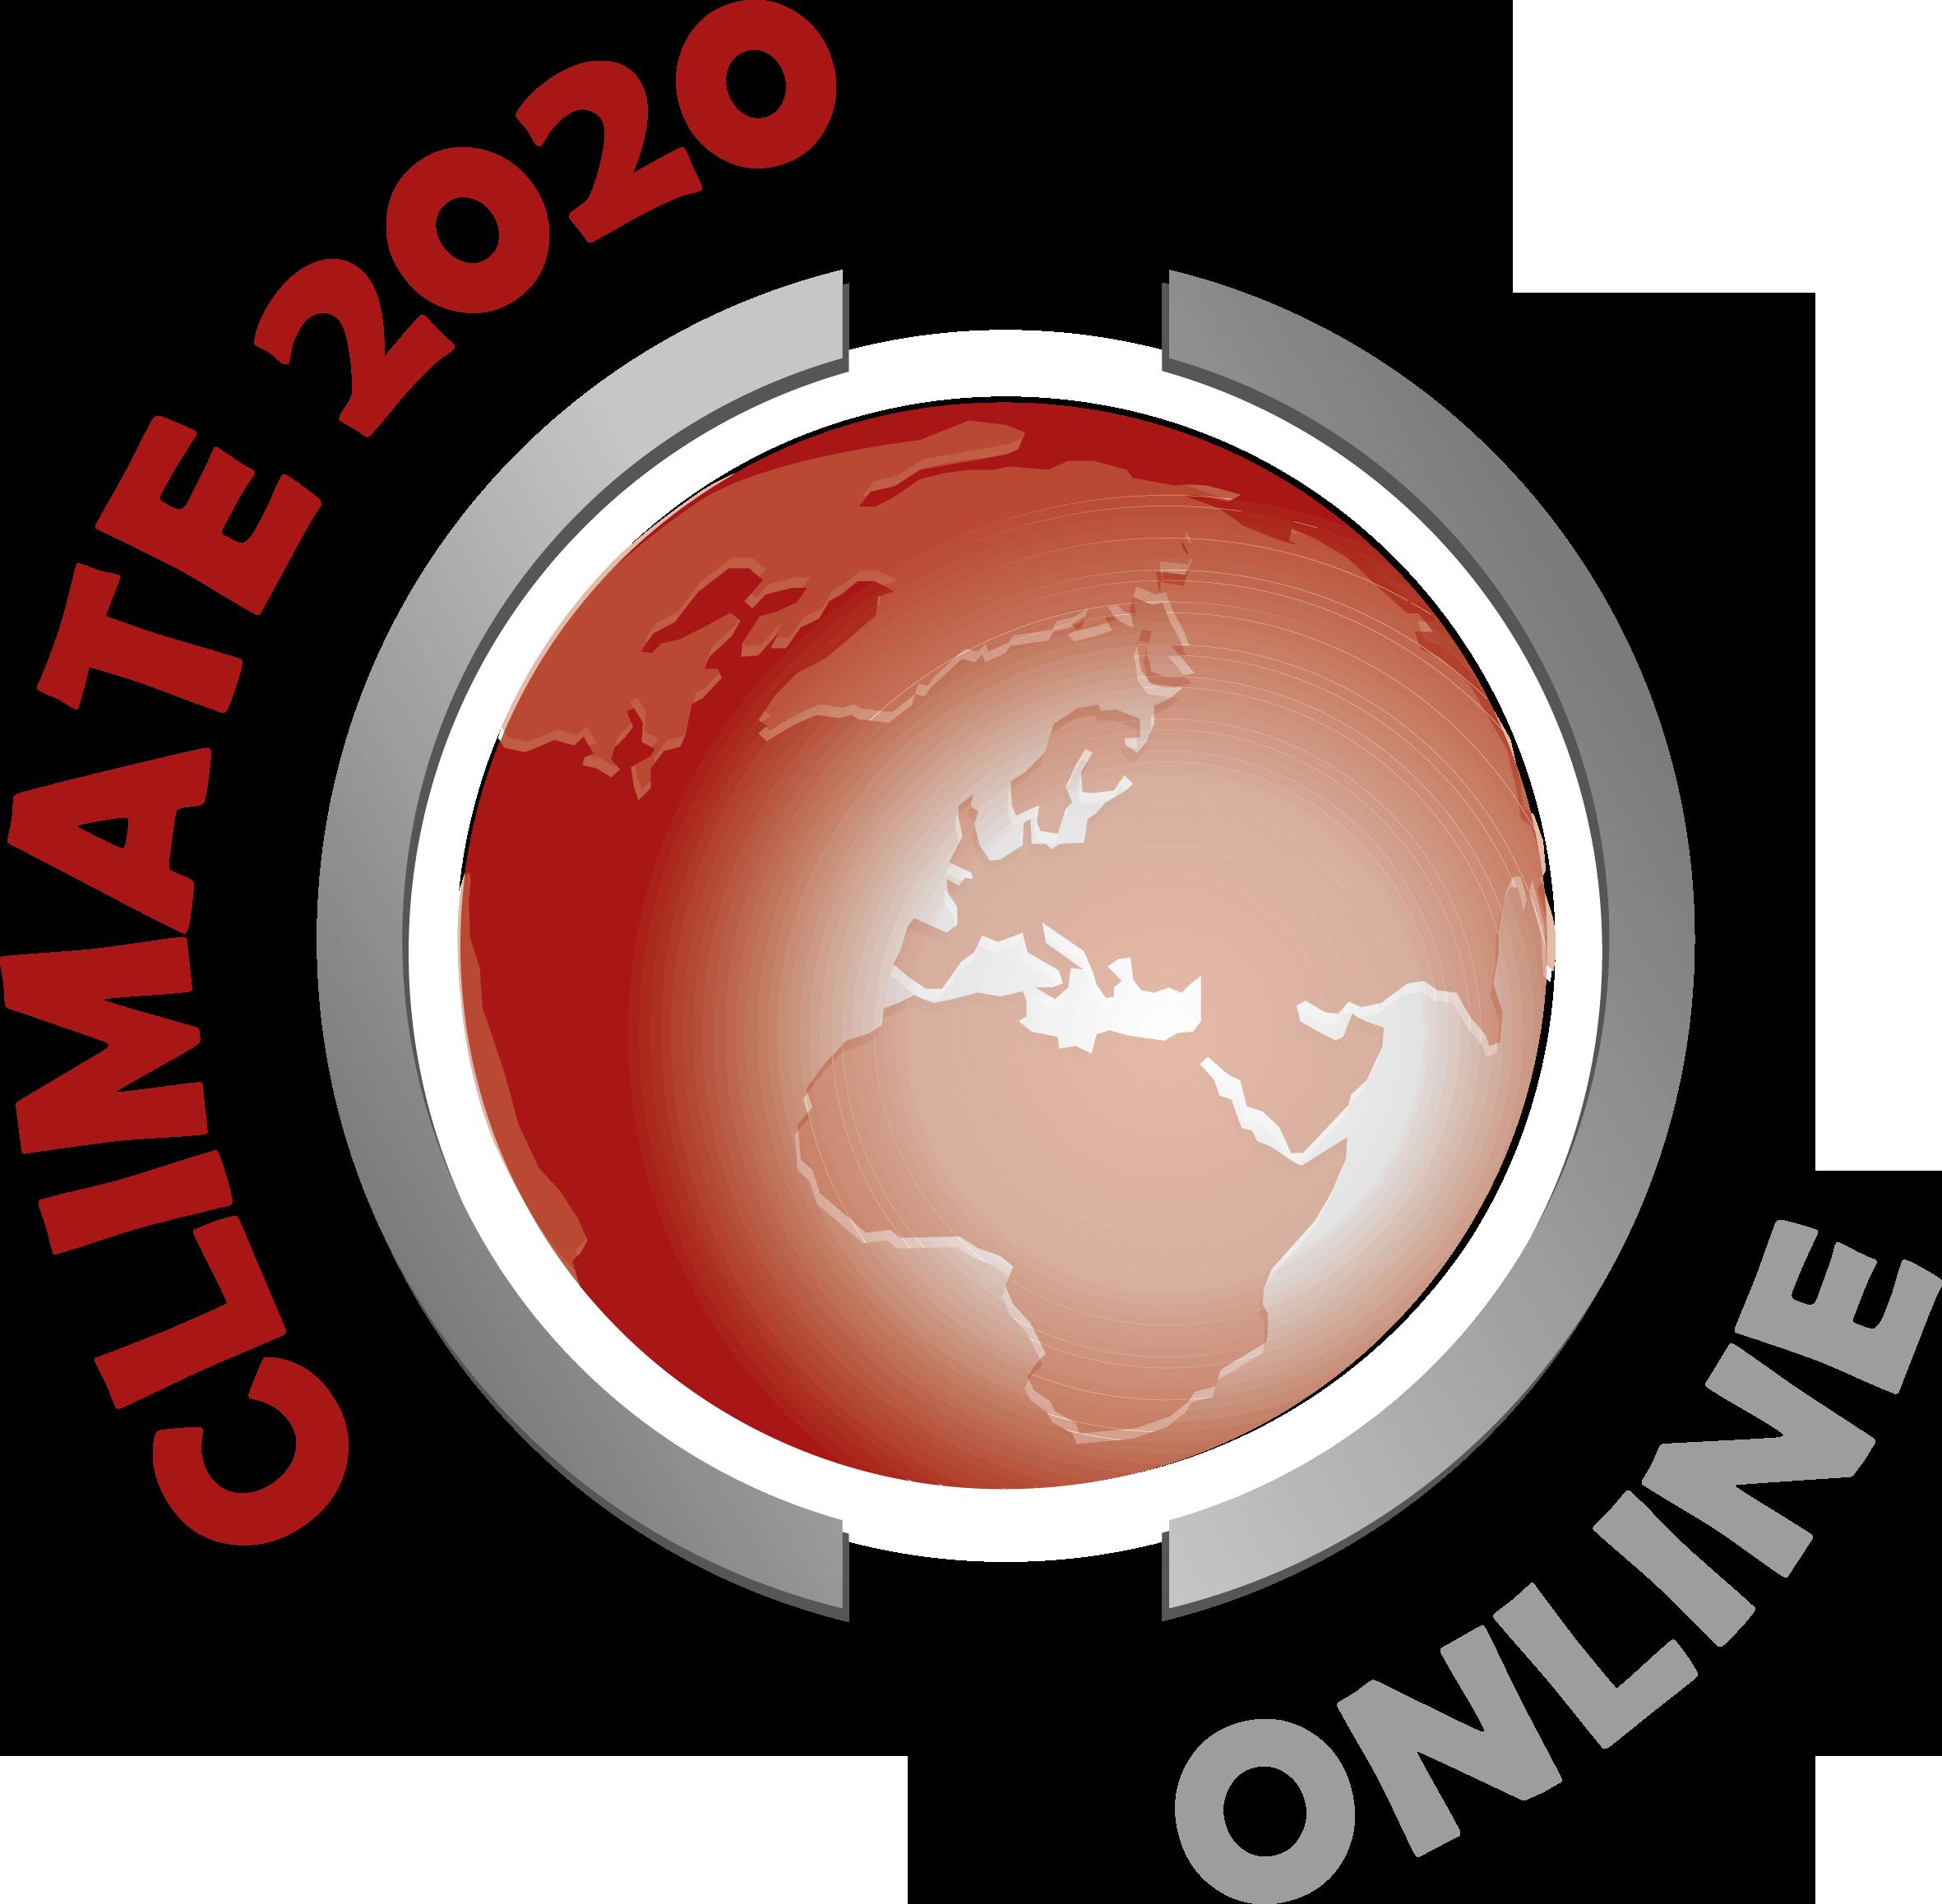 2019-01-16_logo_klima2020_rtansparent.png